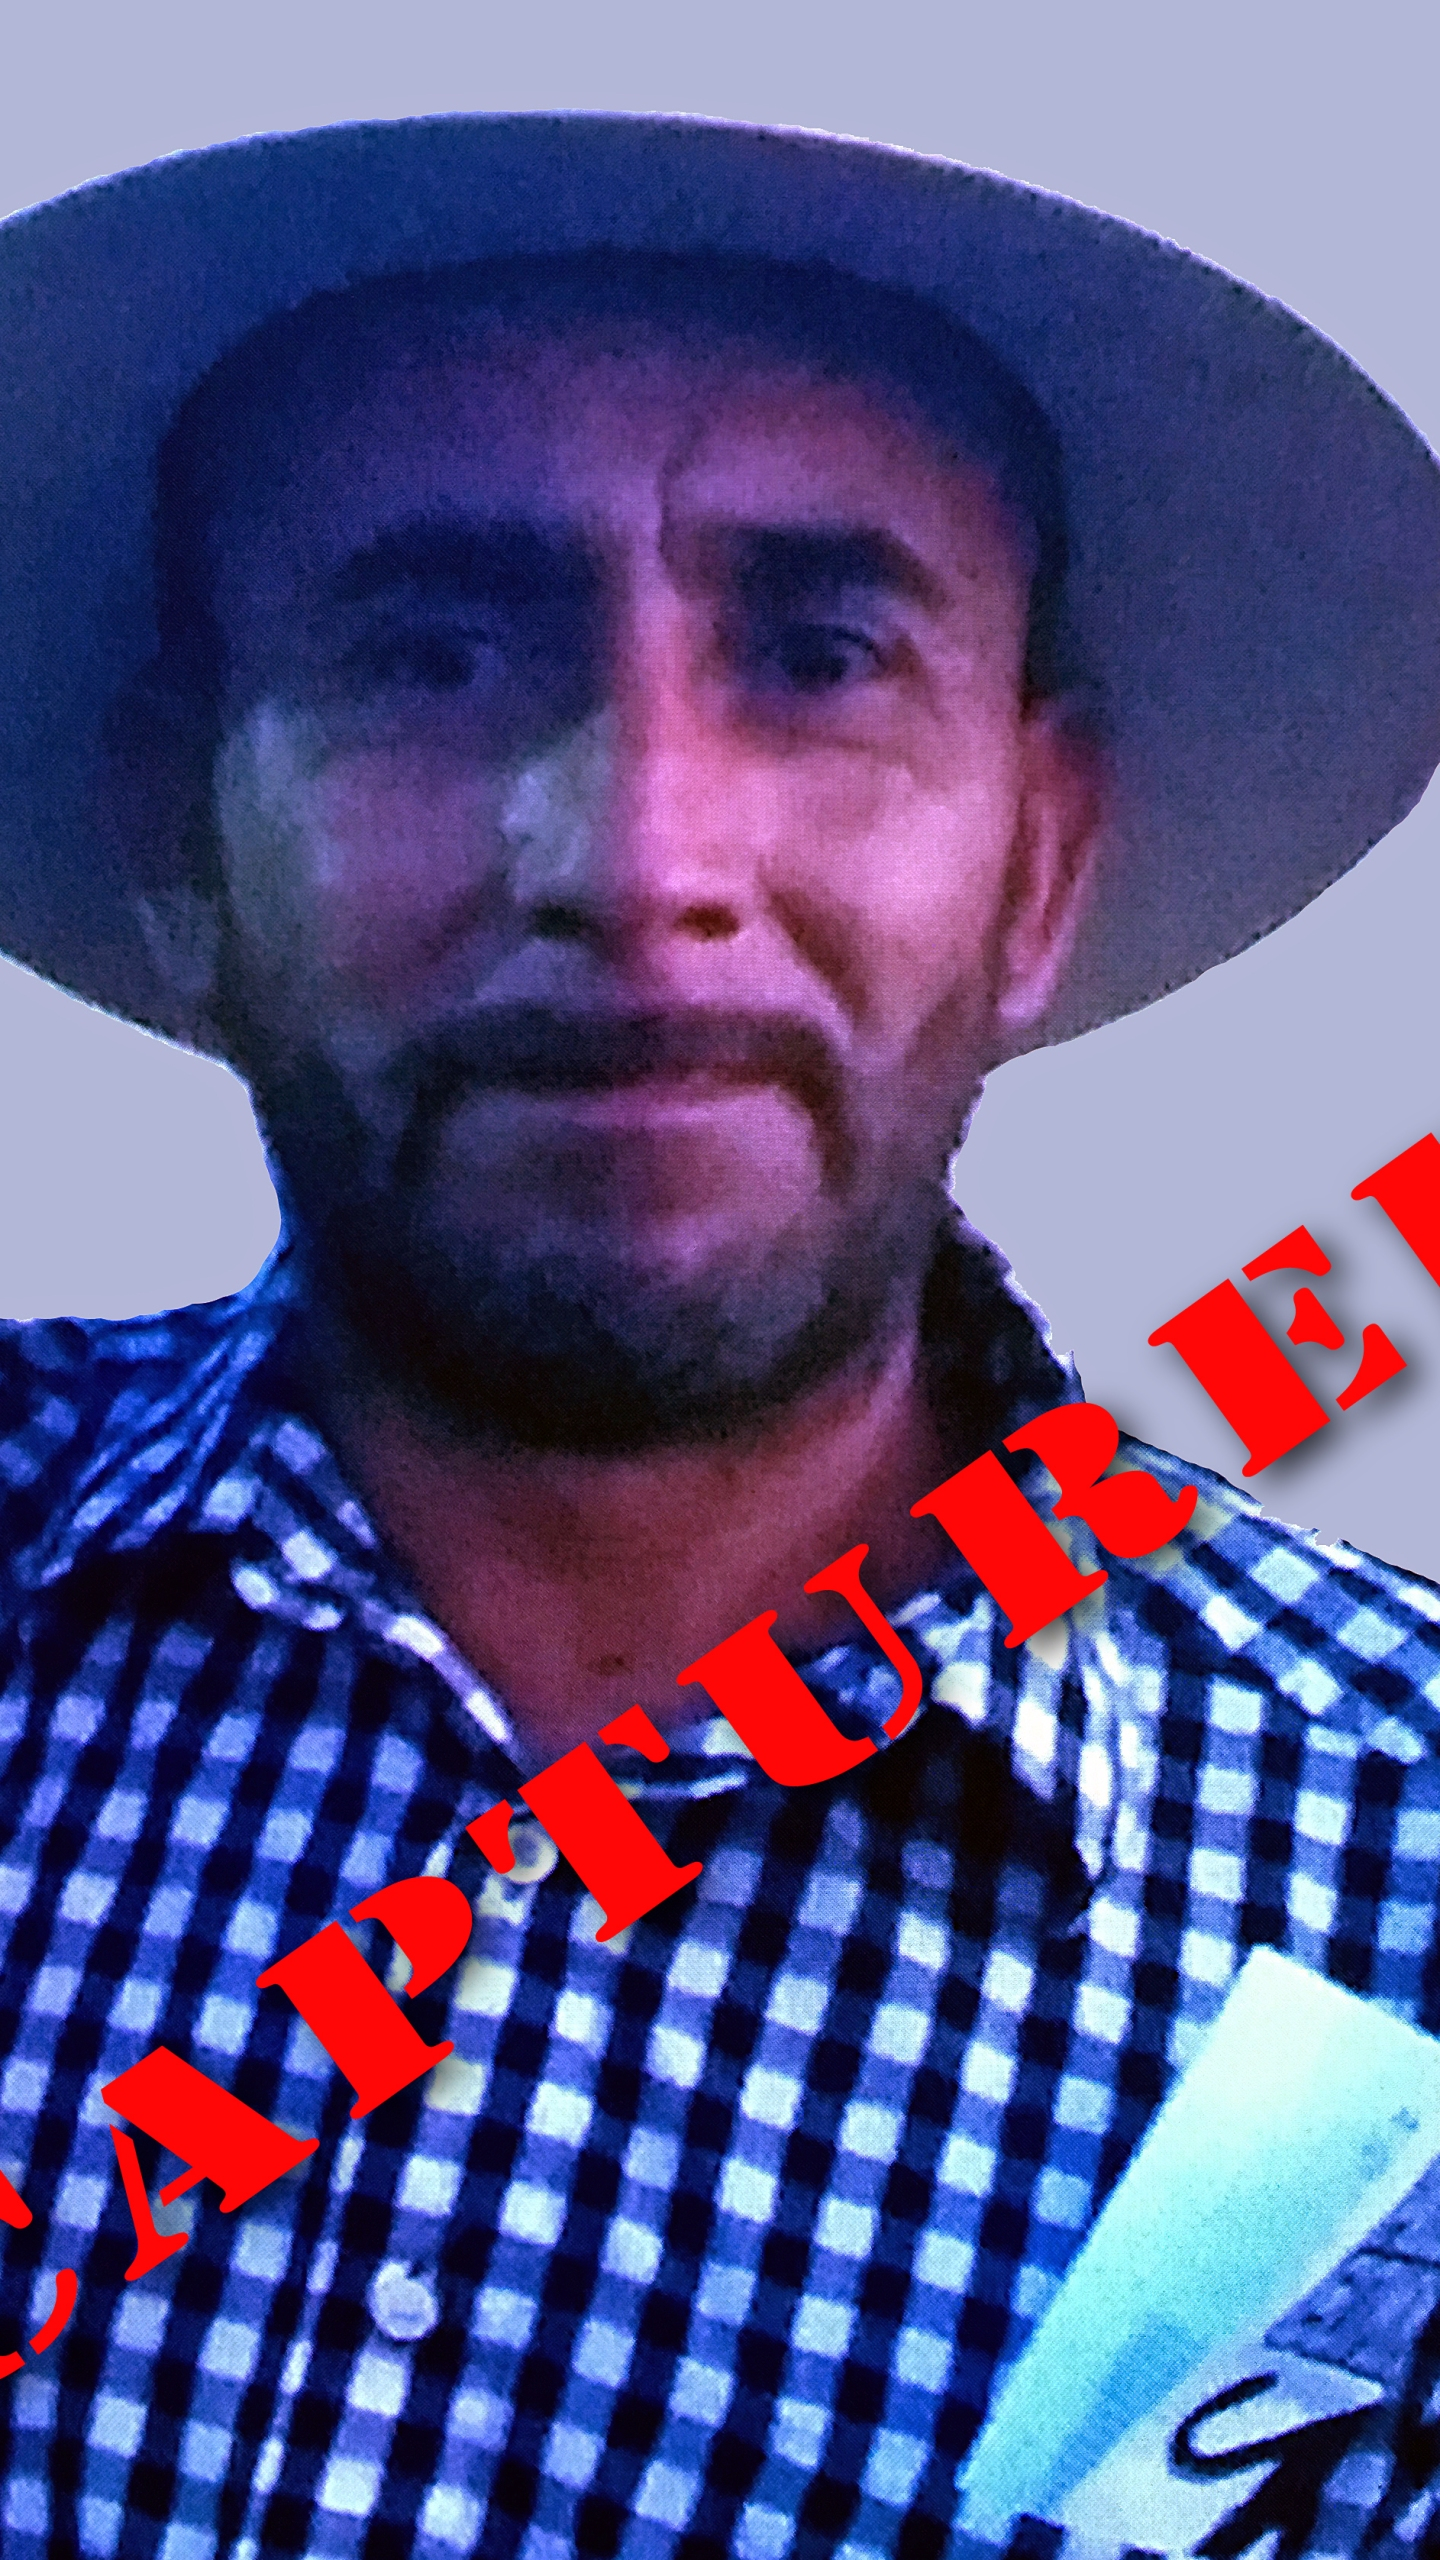 10-17-Suspect-Mario-Zamora-Sanchez-Captured_1476715836659.jpg